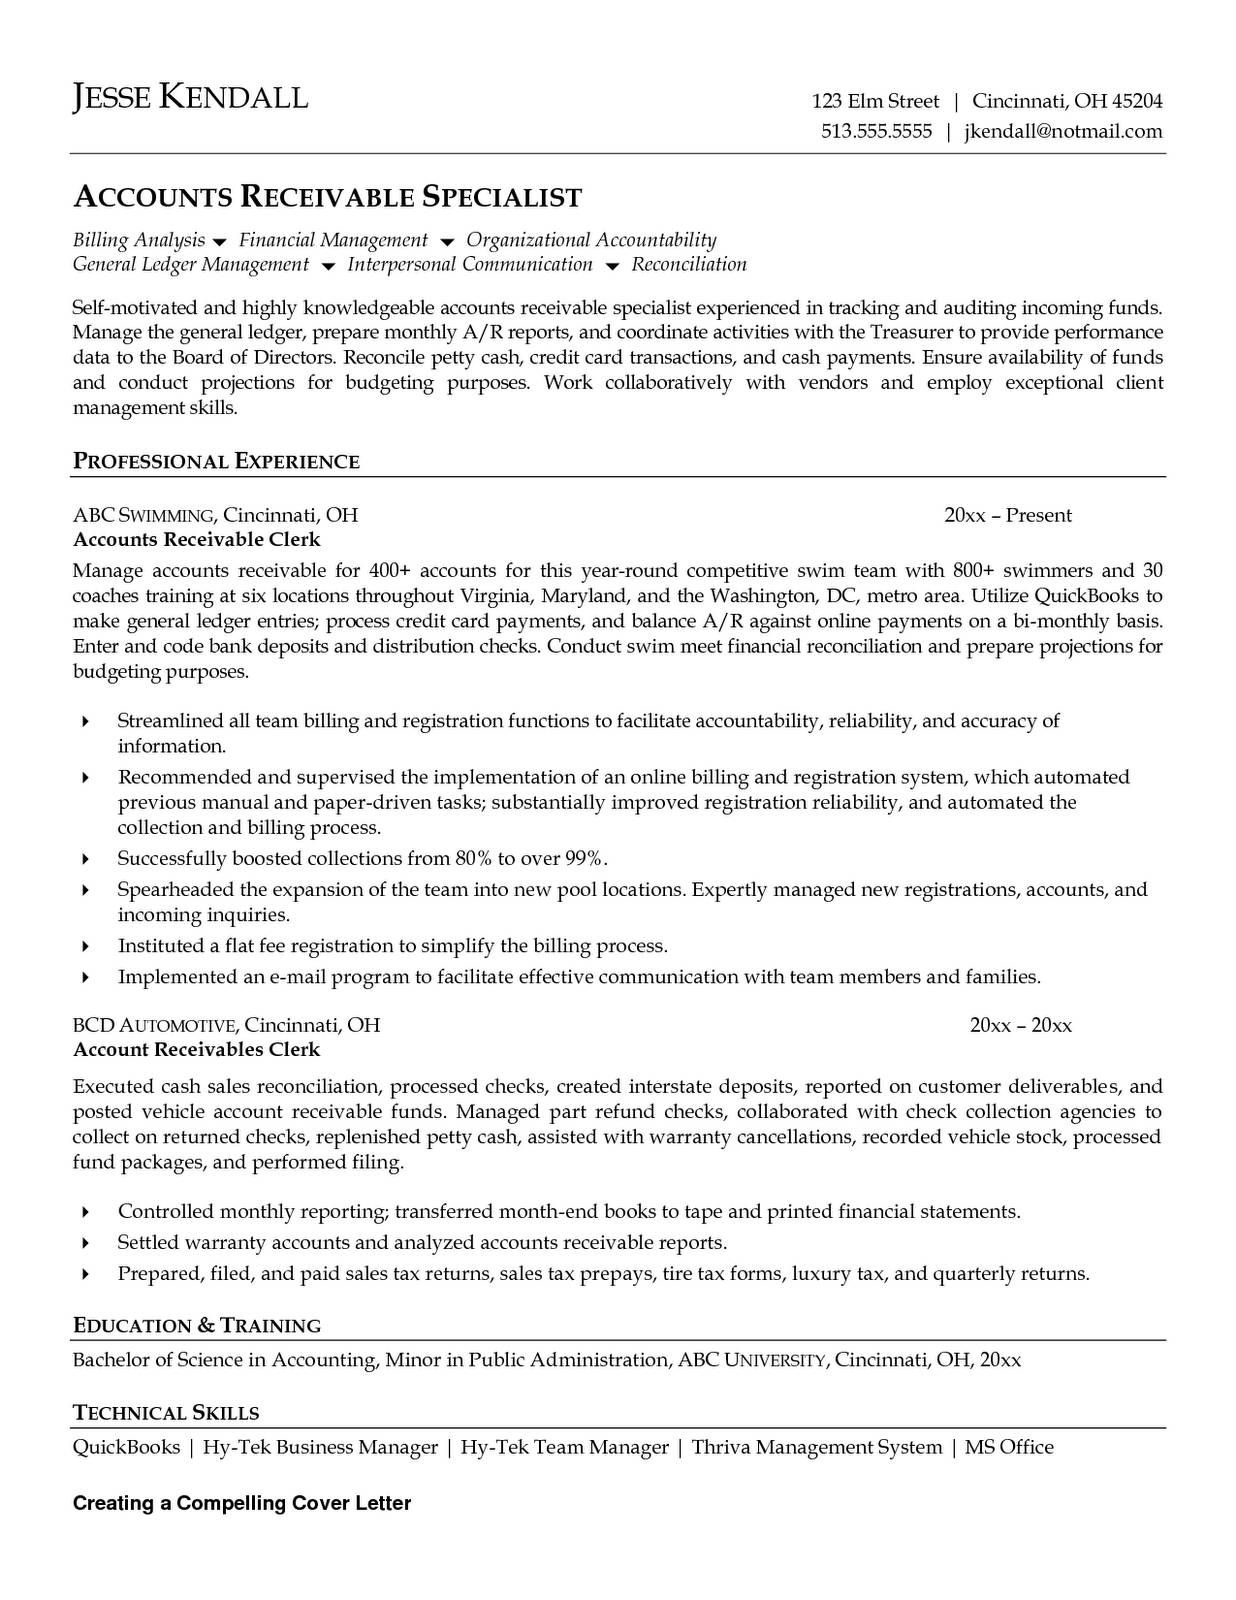 Account Payable Resume Samples